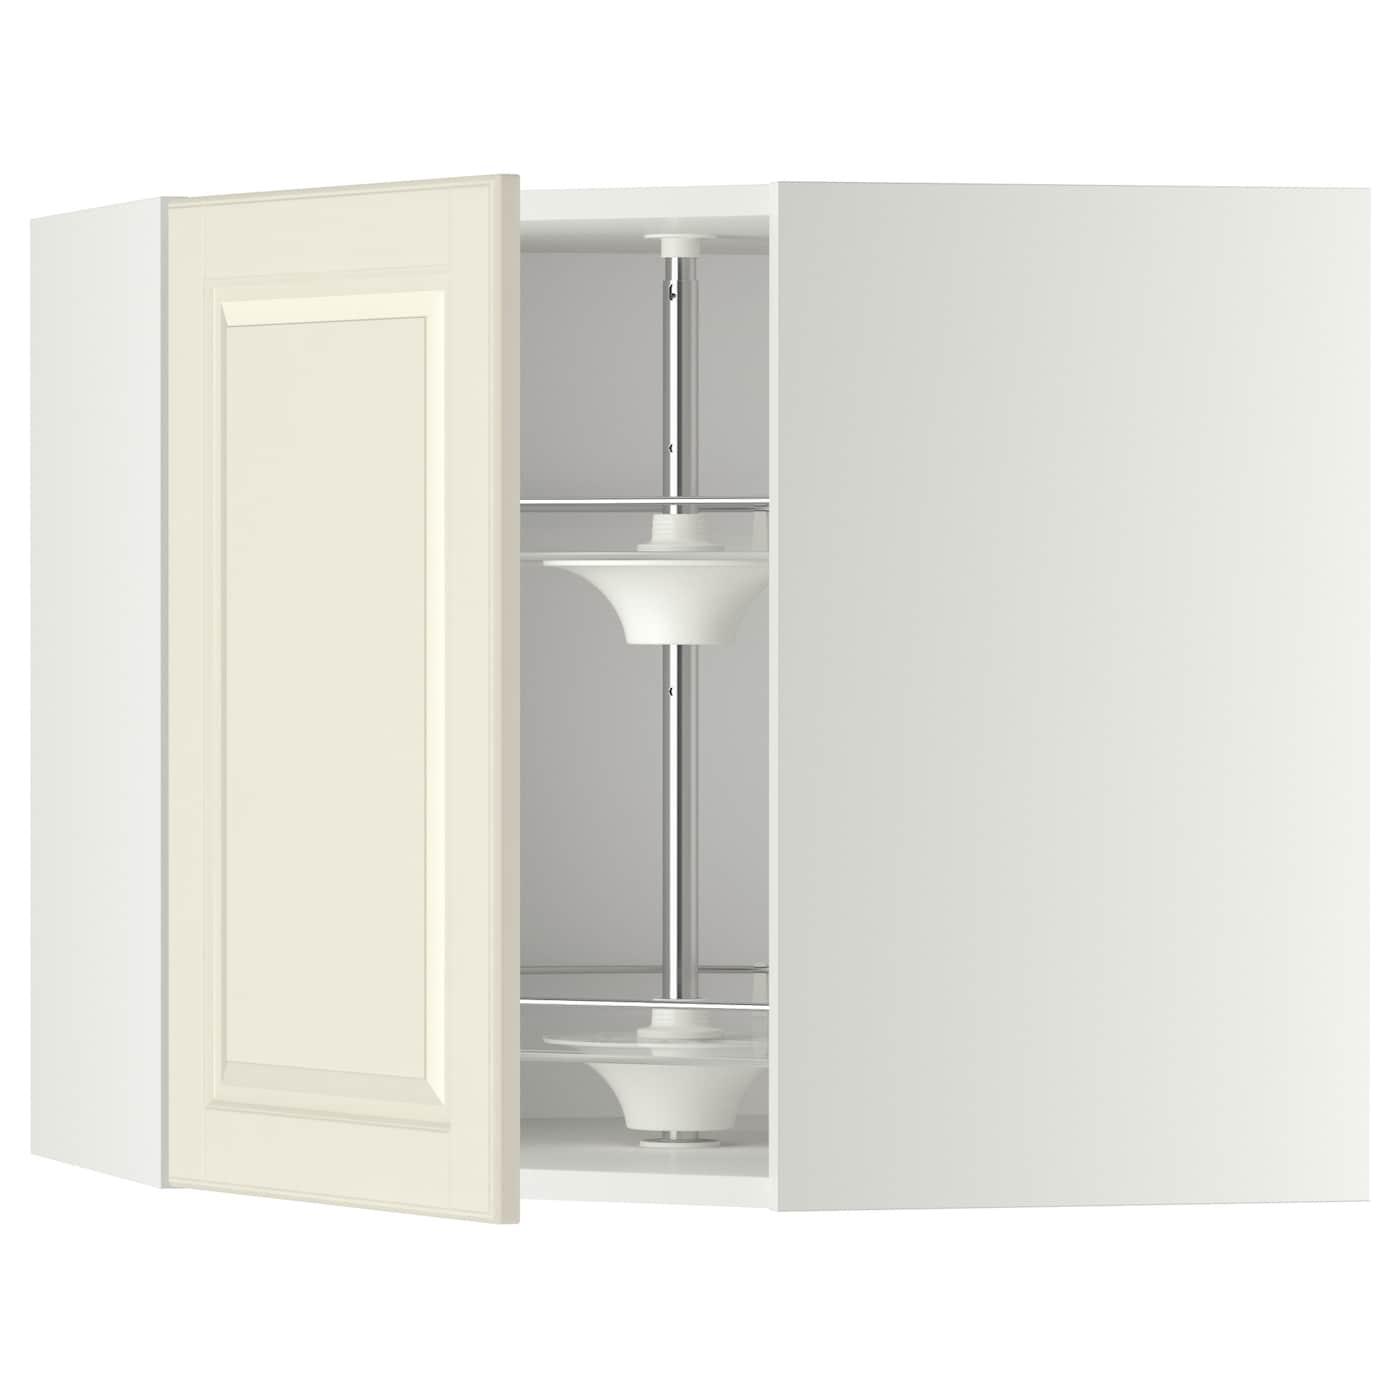 Cuisine Blanc Cassé Ikea : Metod Élt ang mur rgt pivot blanc bodbyn cassé